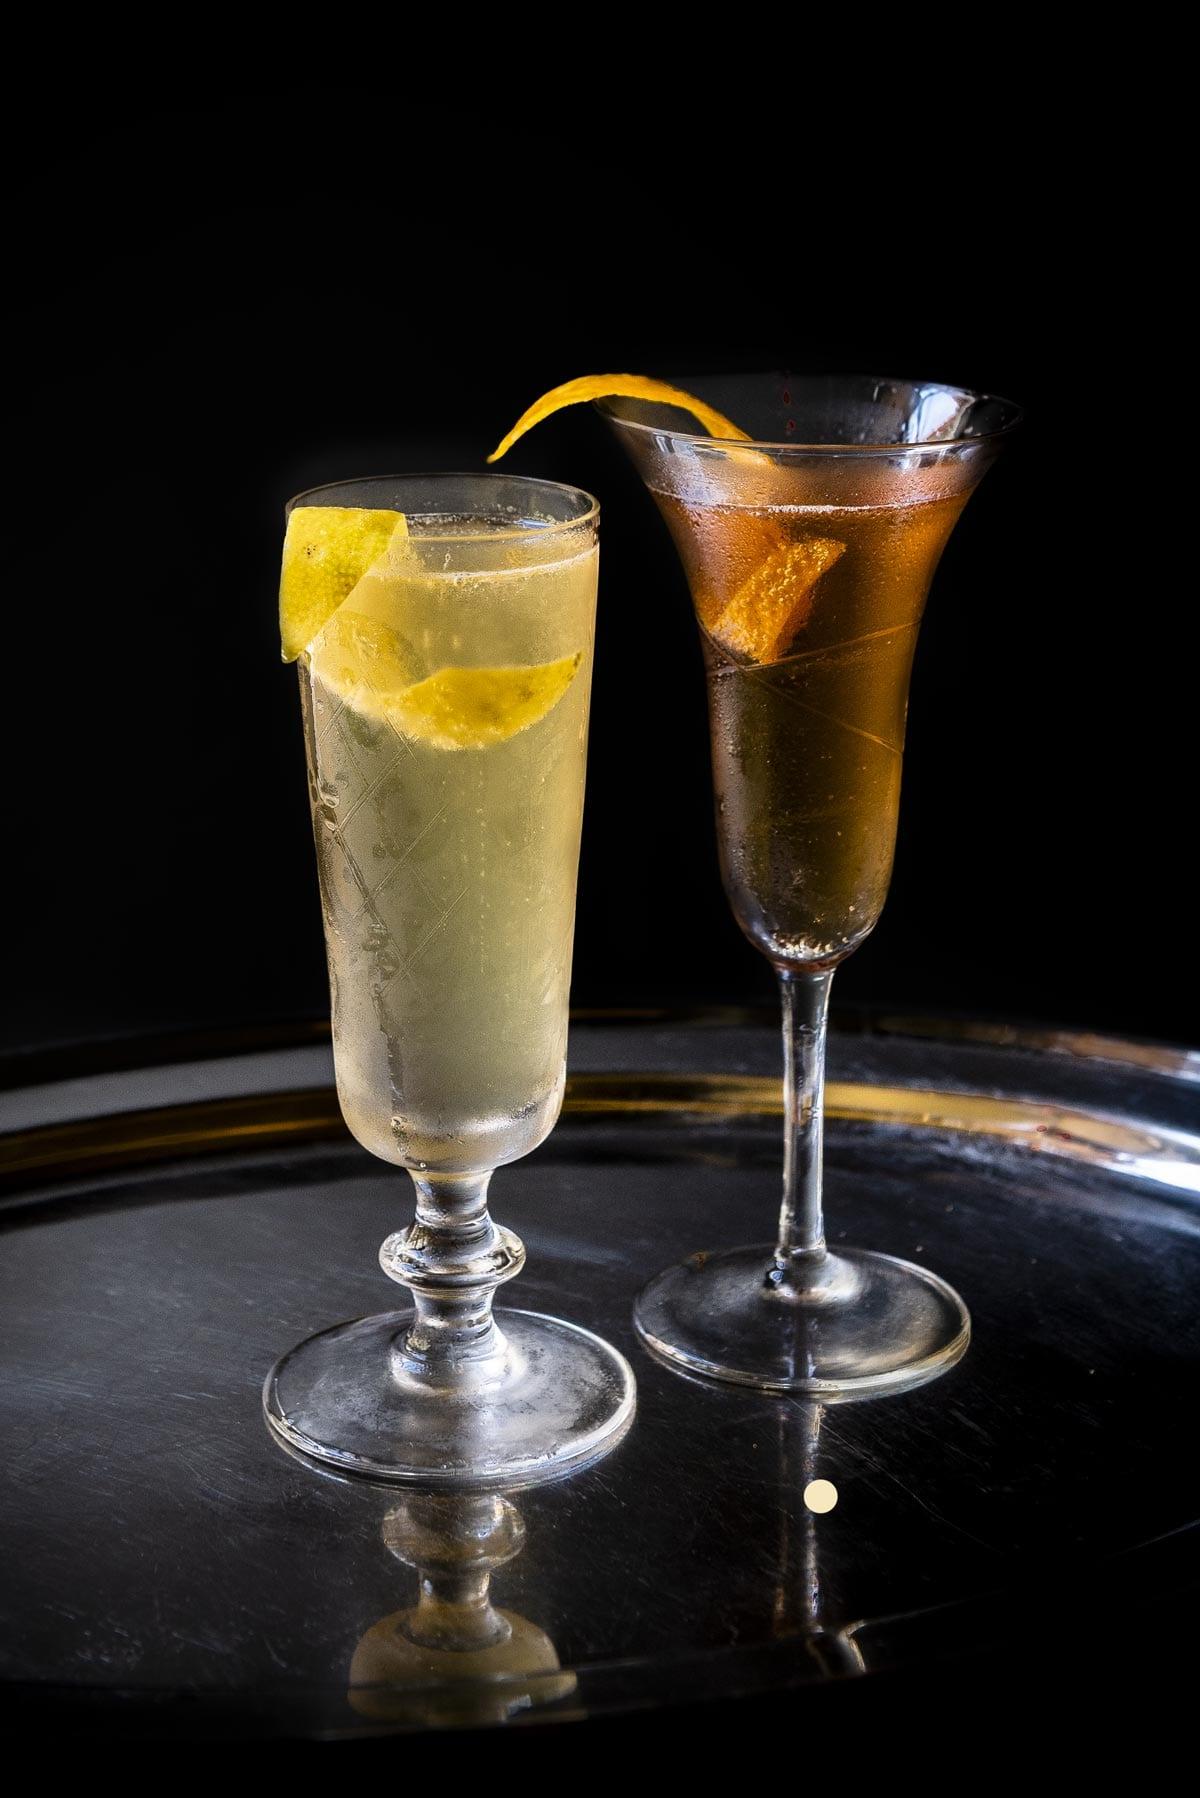 Prince of Wales Cocktail Geschichte | Mixology - Magazin für Barkultur